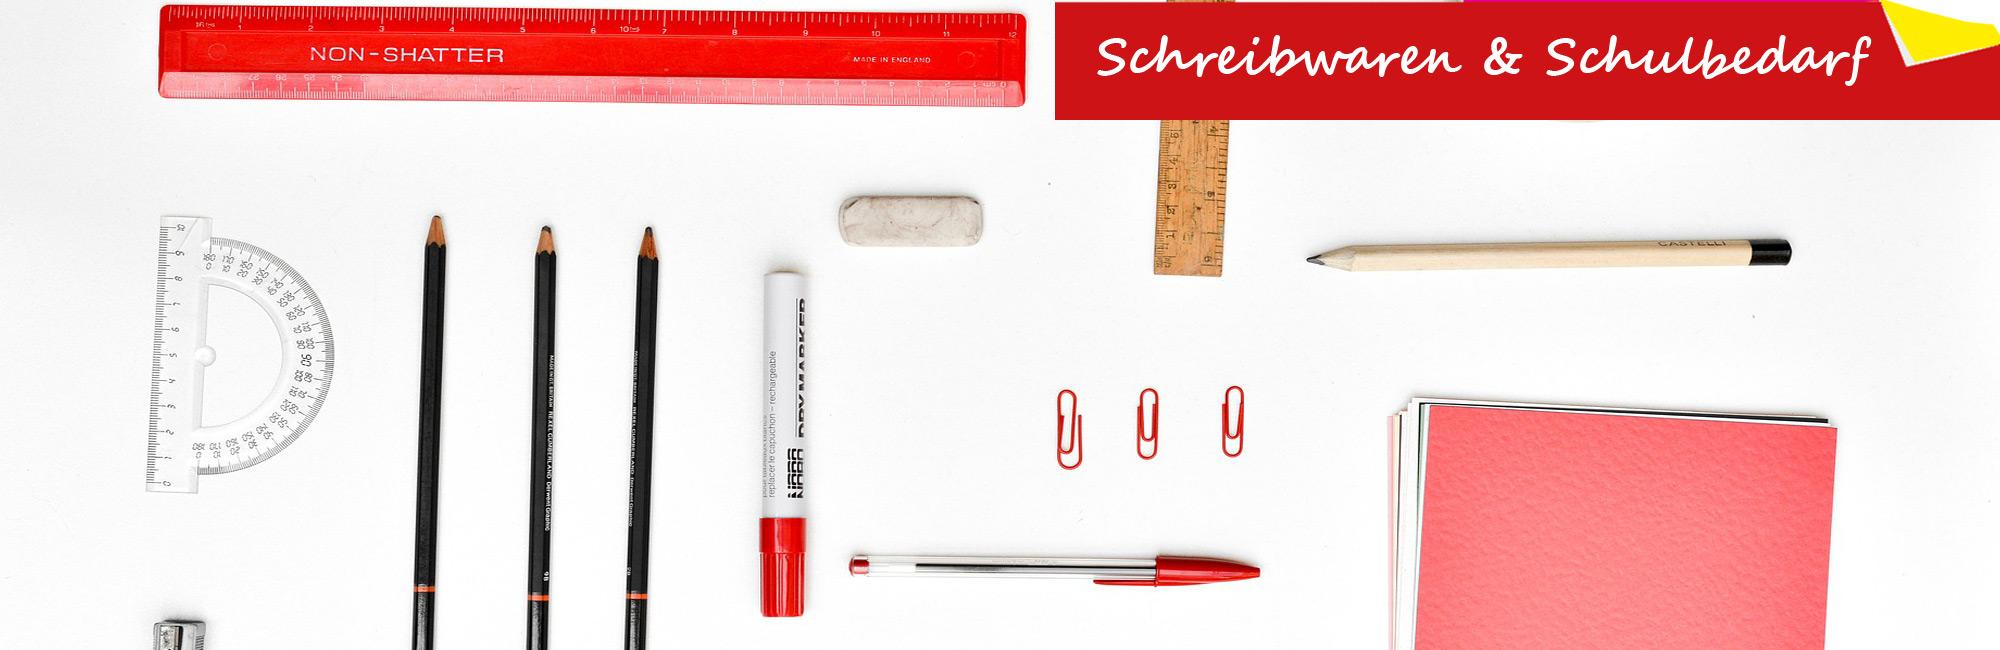 Schreibwaren & Schulbedarf